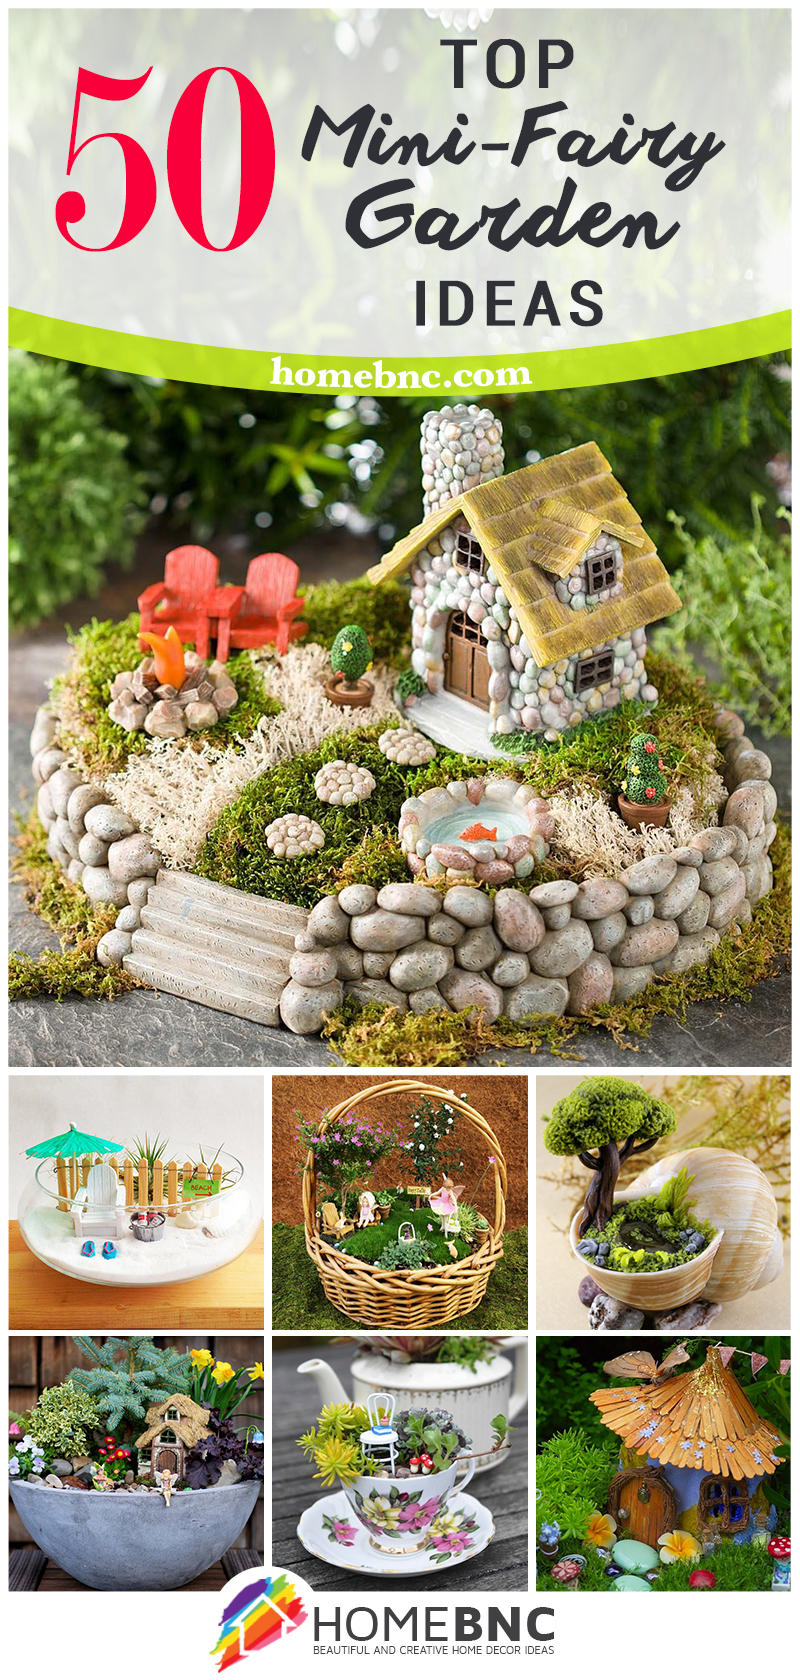 The 50 Best Diy Miniature Fairy Garden Ideas In 2020